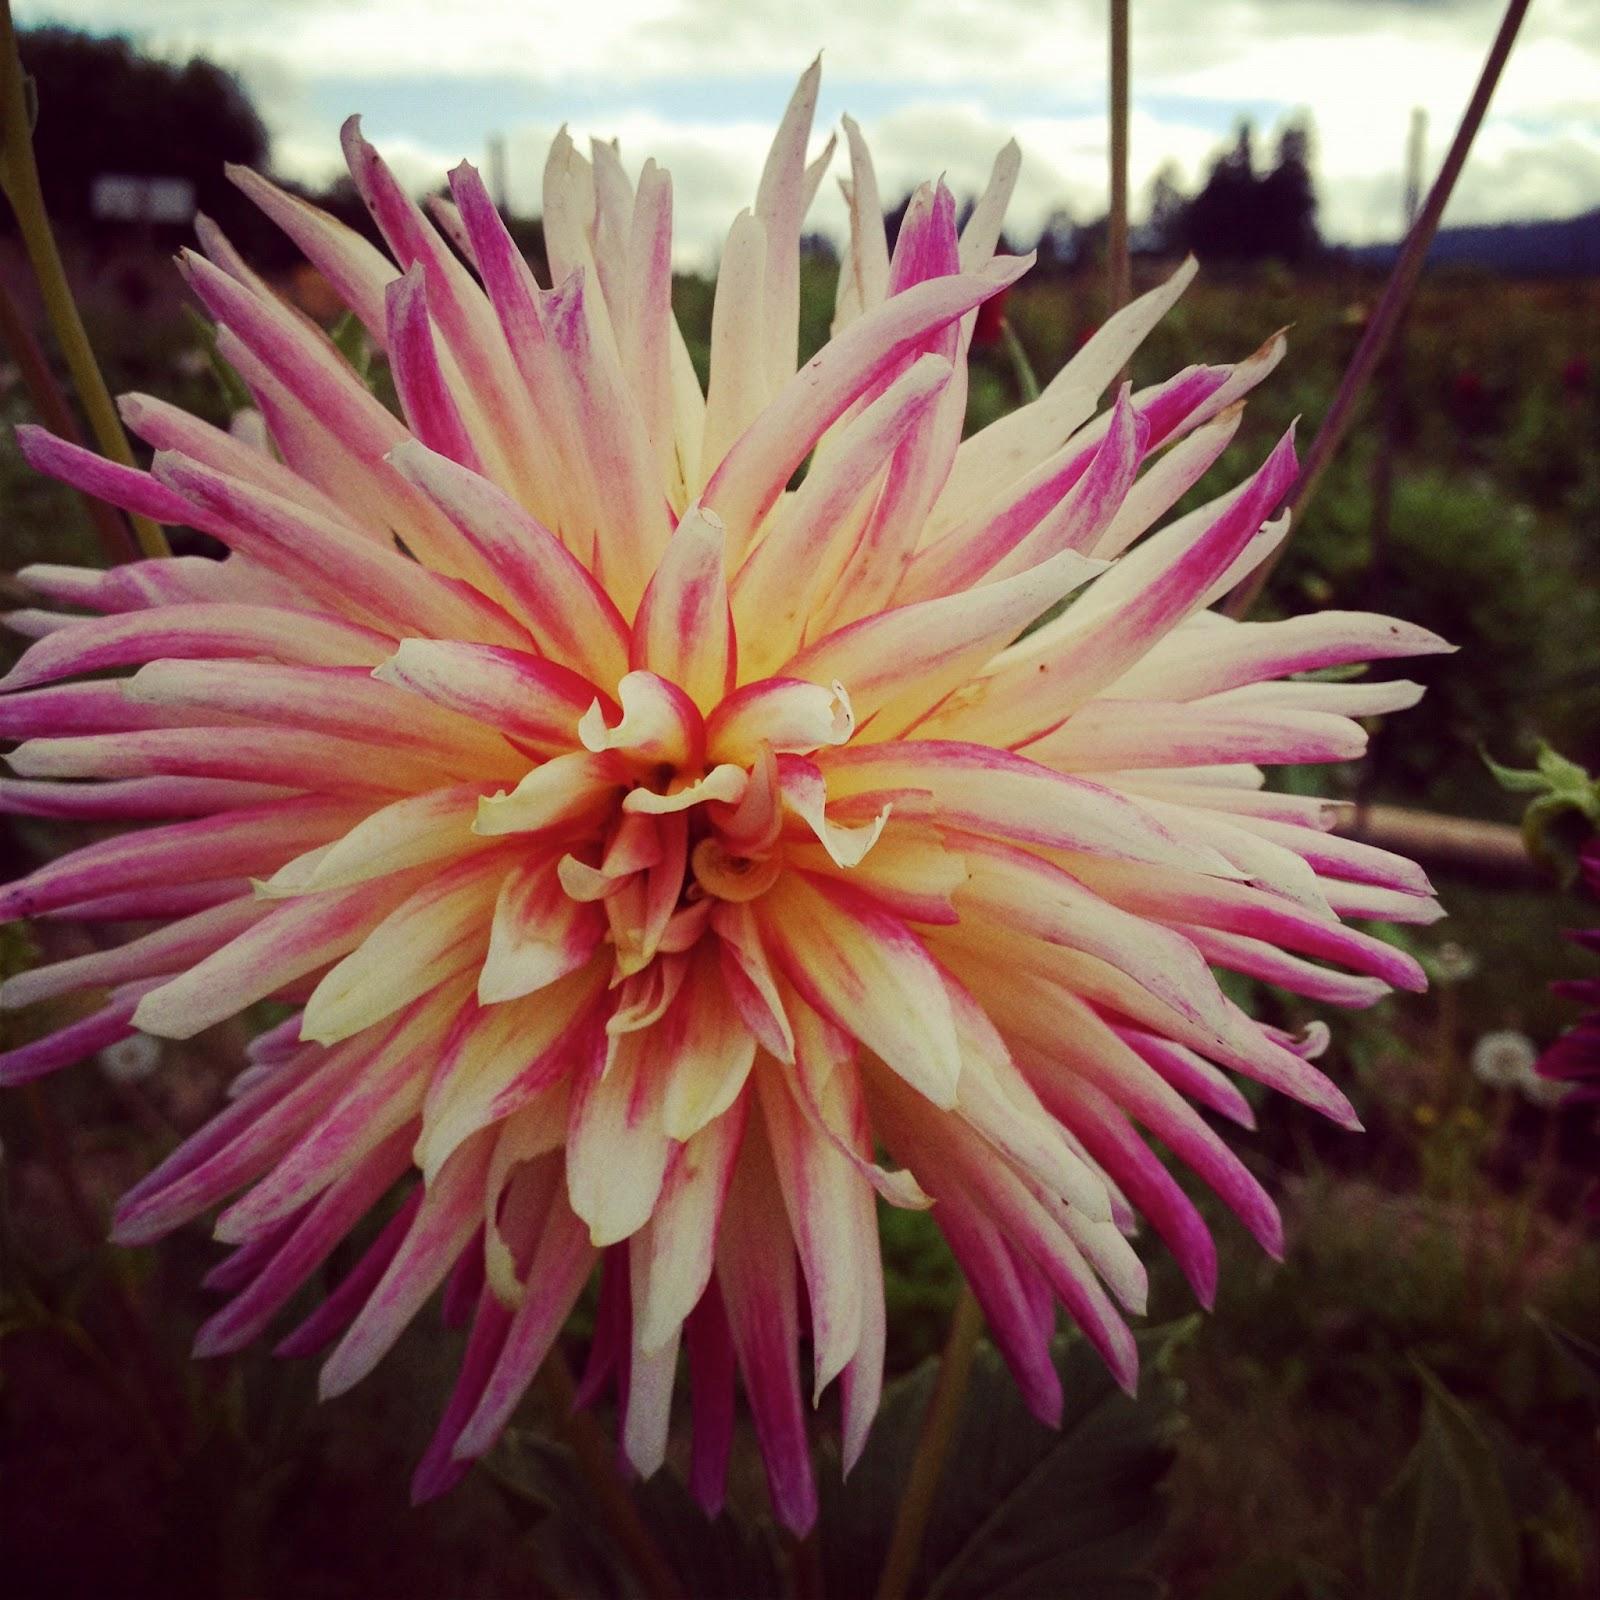 Make Your Own Wedding Flowers: Random Thoughts In Random World: Handmade Wedding: Make